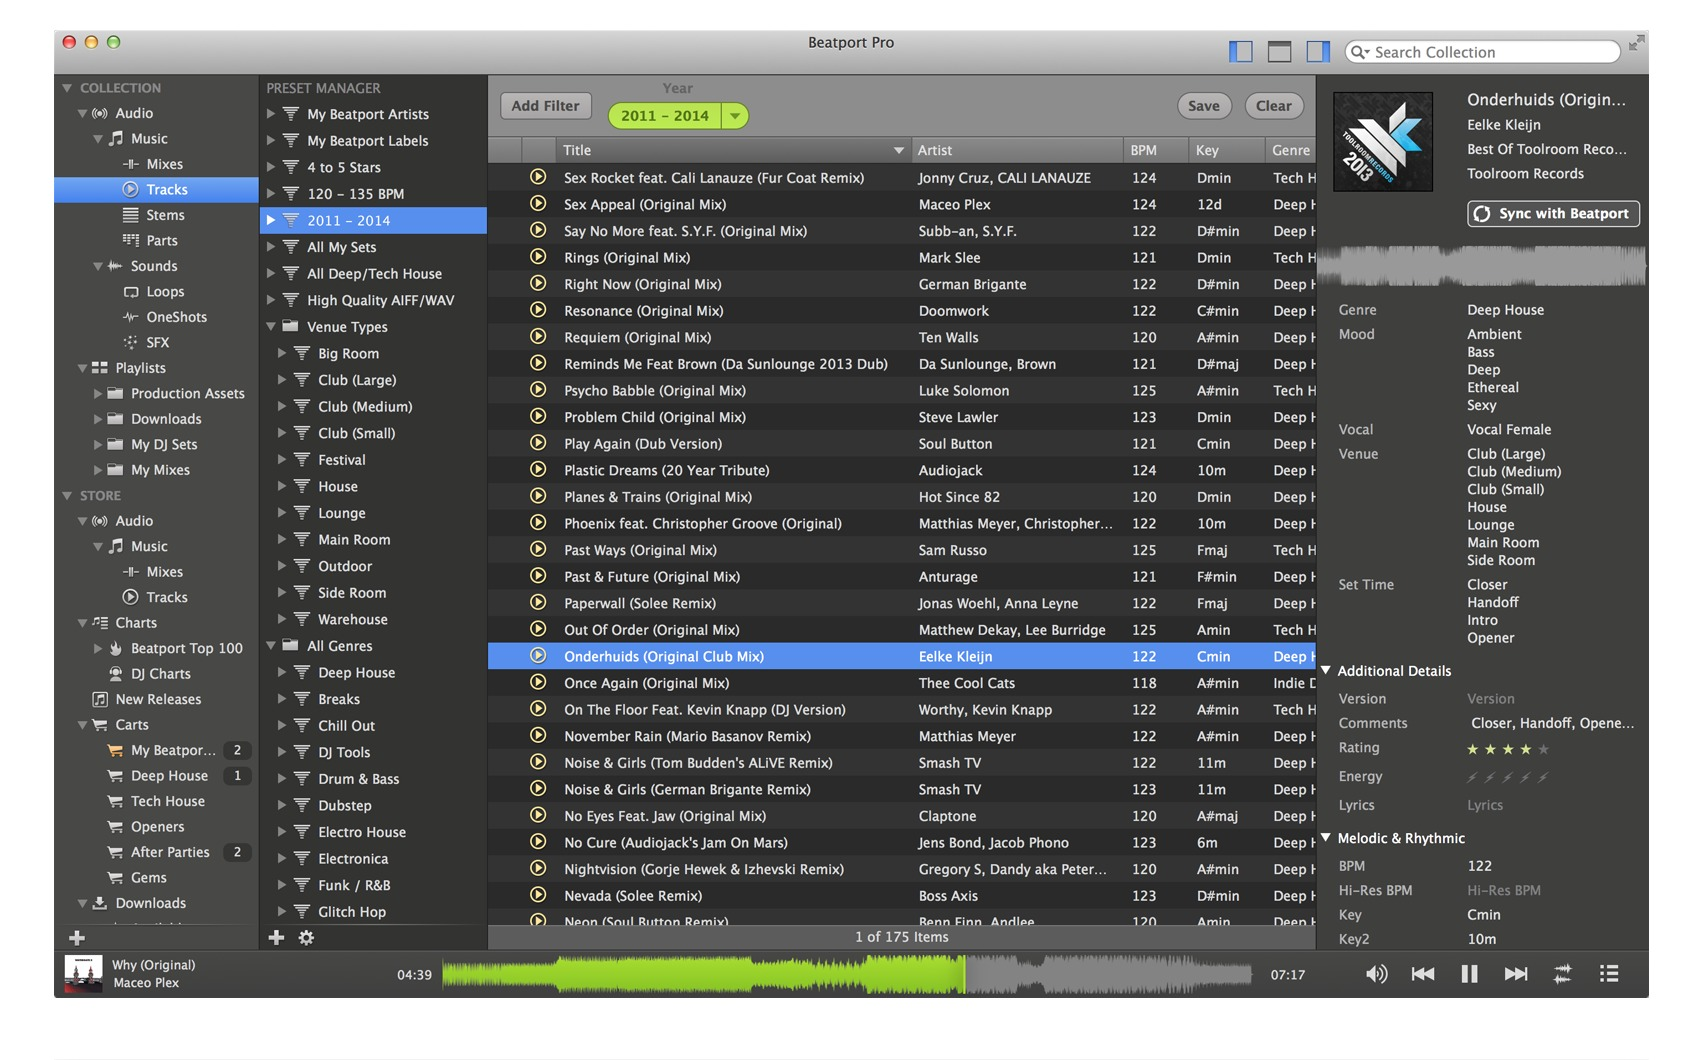 Download Beatport SYNC 1.0.1 - softpedia.com